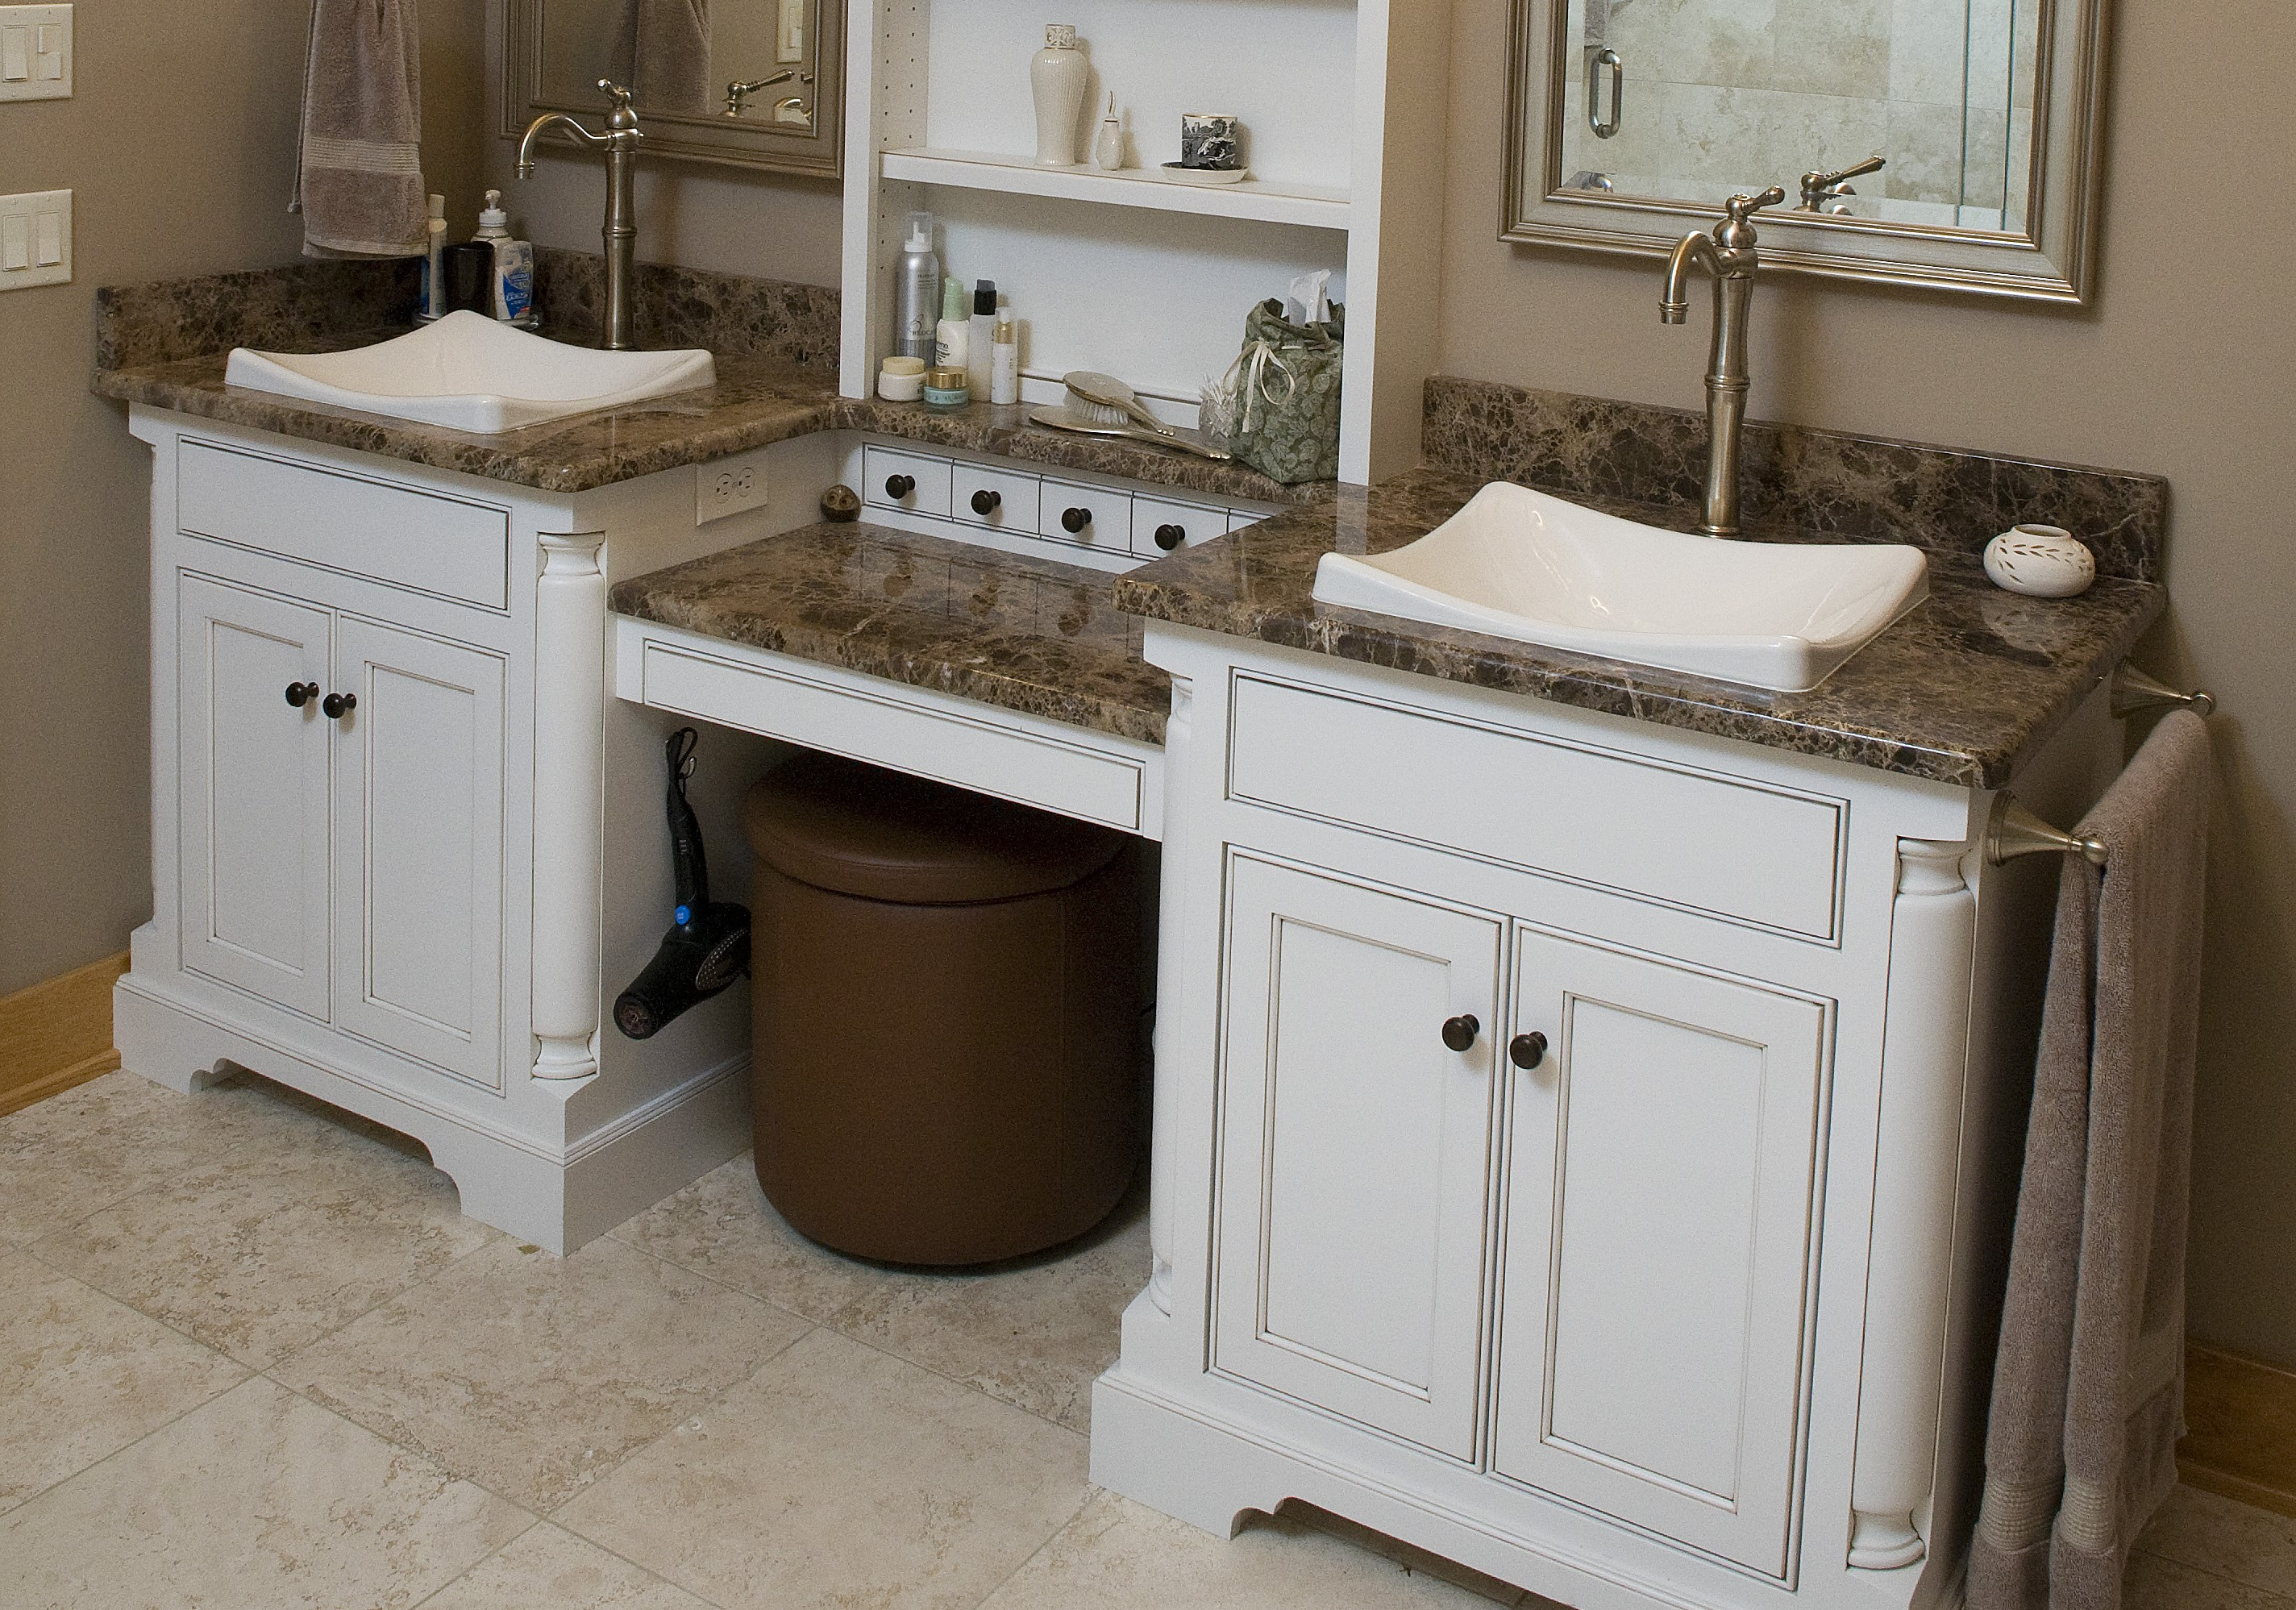 Universal Design for the Bathroom image 3